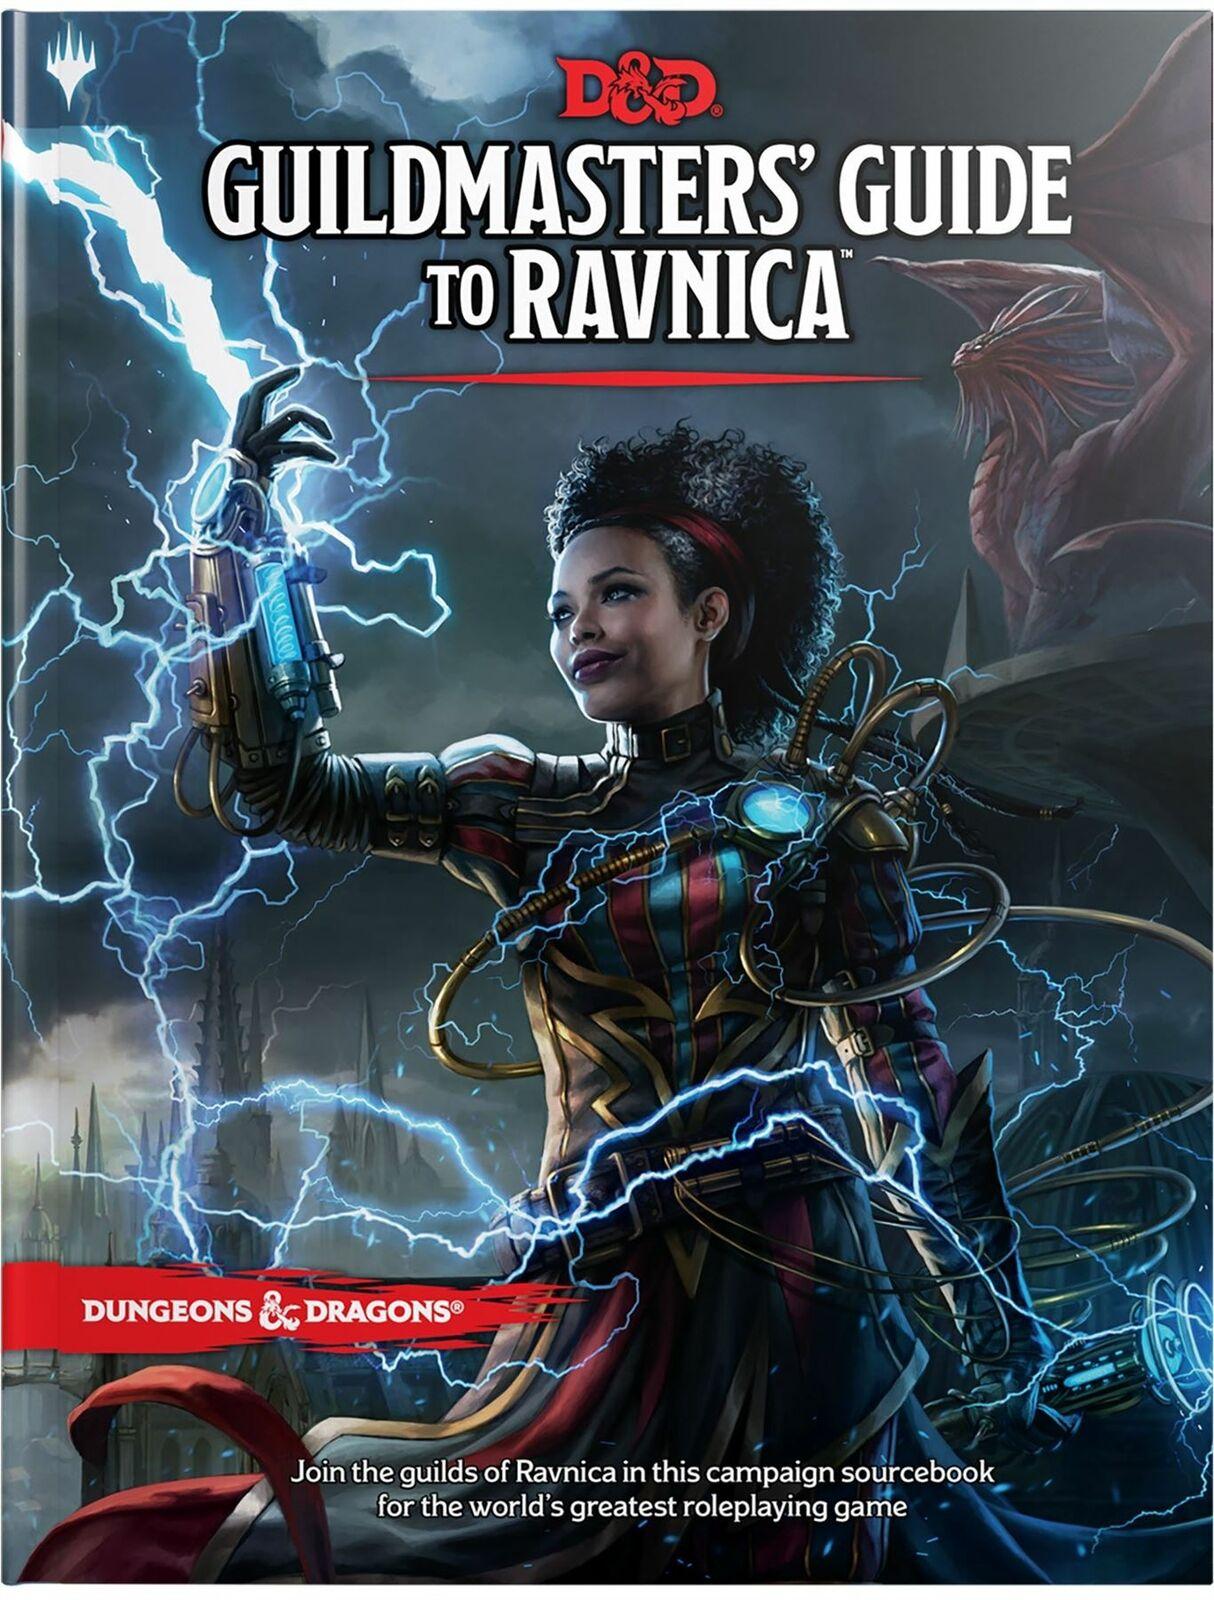 Dungeons & Dragons  guildmasters Guide to Ravnica (AVVENTURA & impostazione campagna)  grande sconto